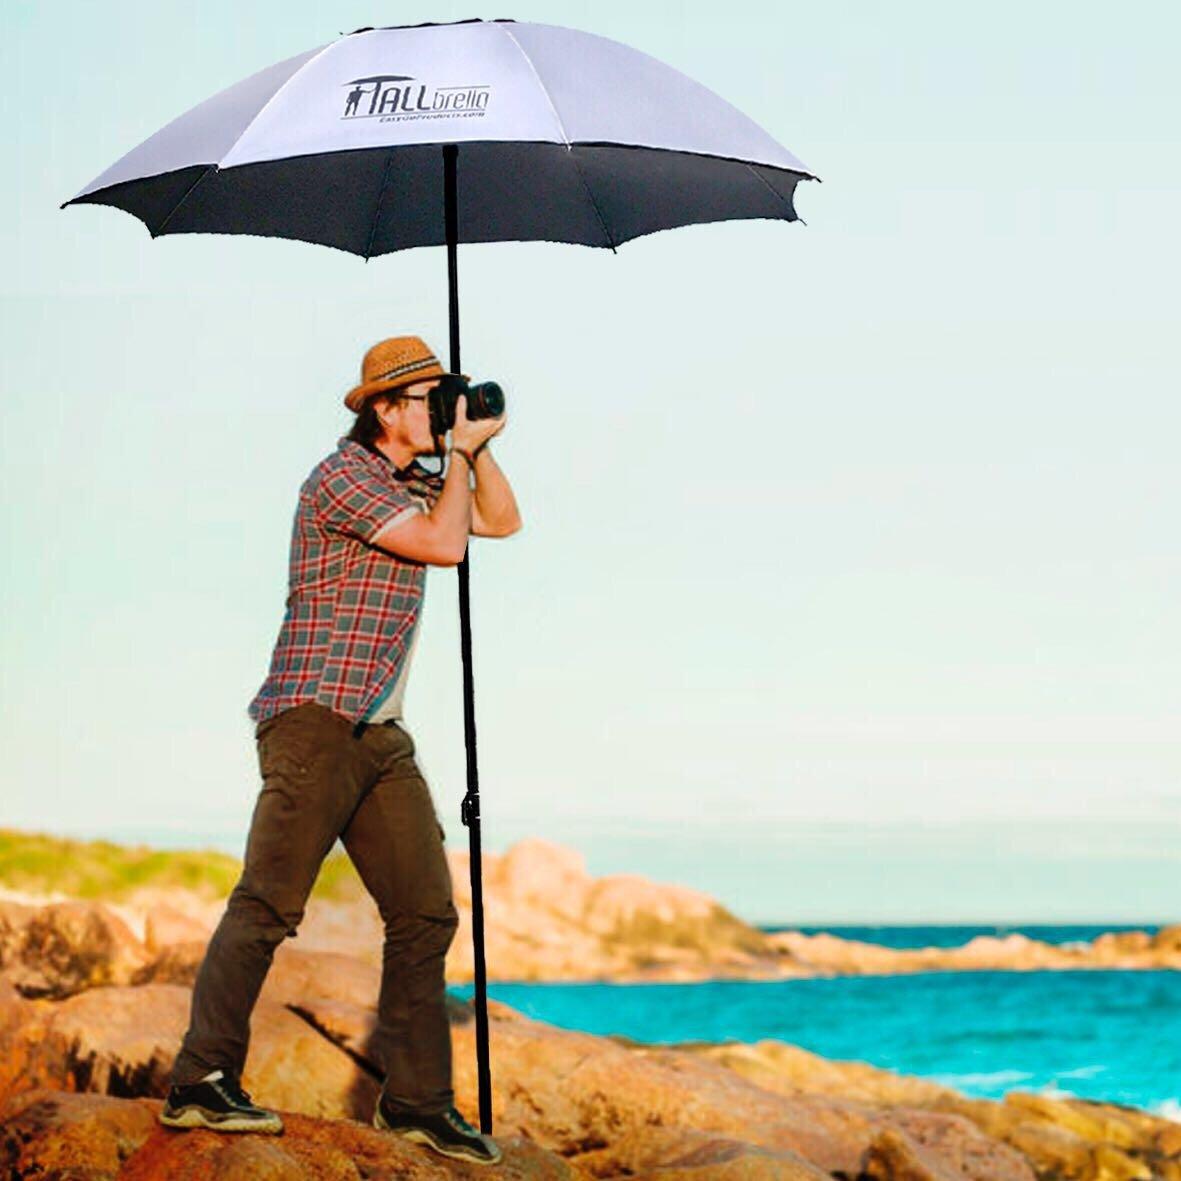 EasyGO Products Tallbrella - Artist/Photography/Sports Umbrella, 48'' Round